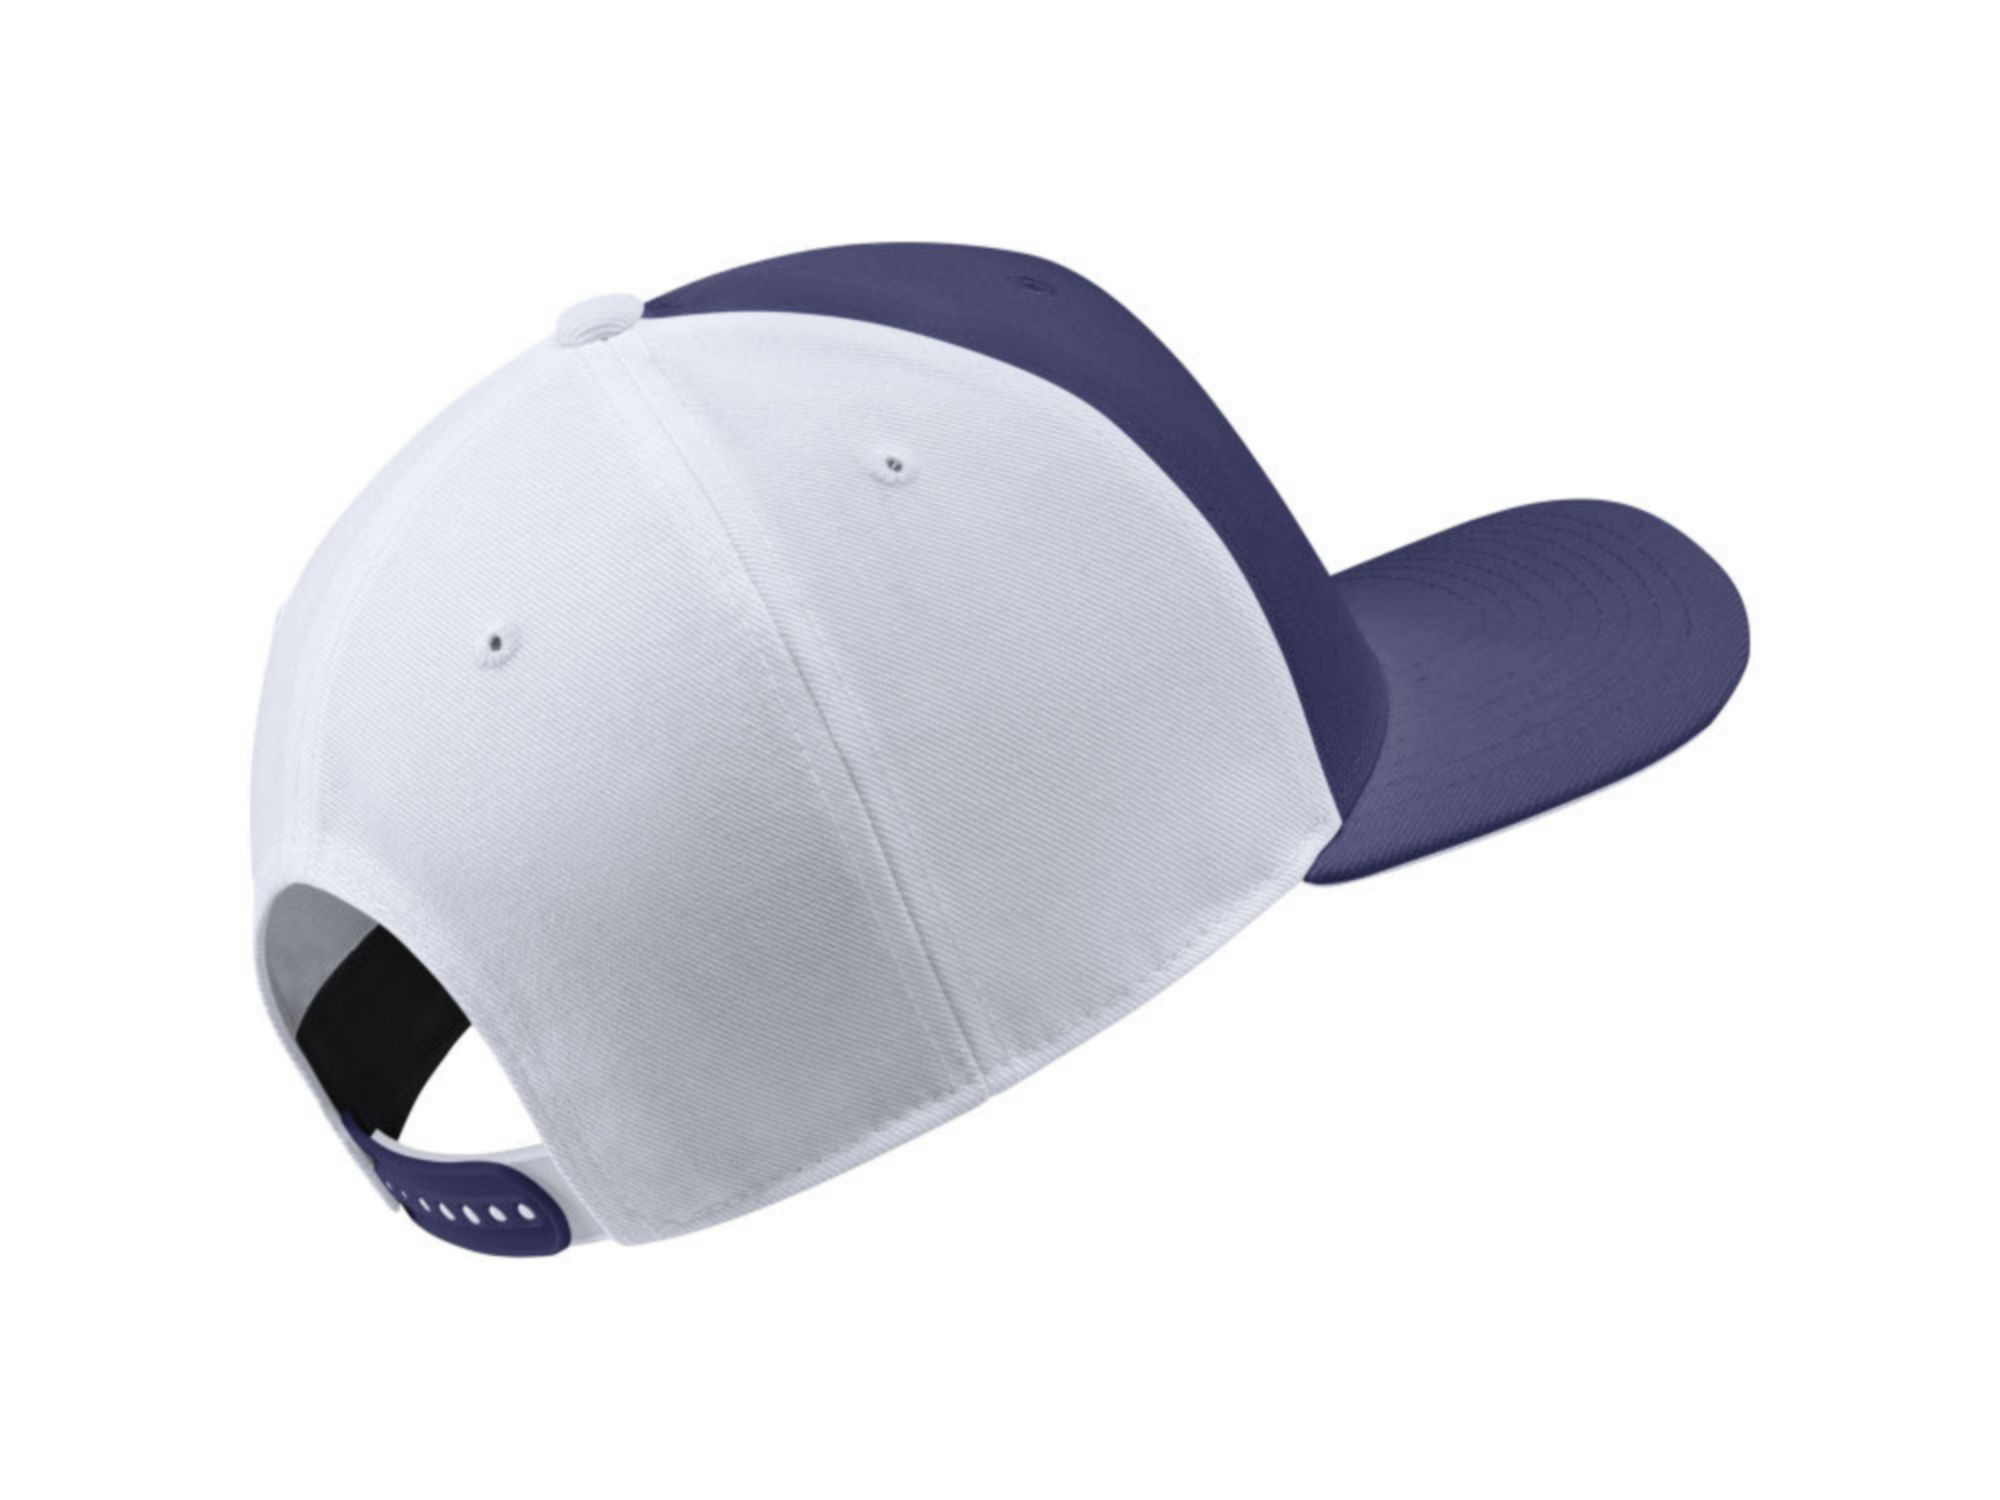 Nike Los Angeles Dodgers Plate Classic 99 Adjustable Cap & Reviews - MLB - Sports Fan Shop - Macy's